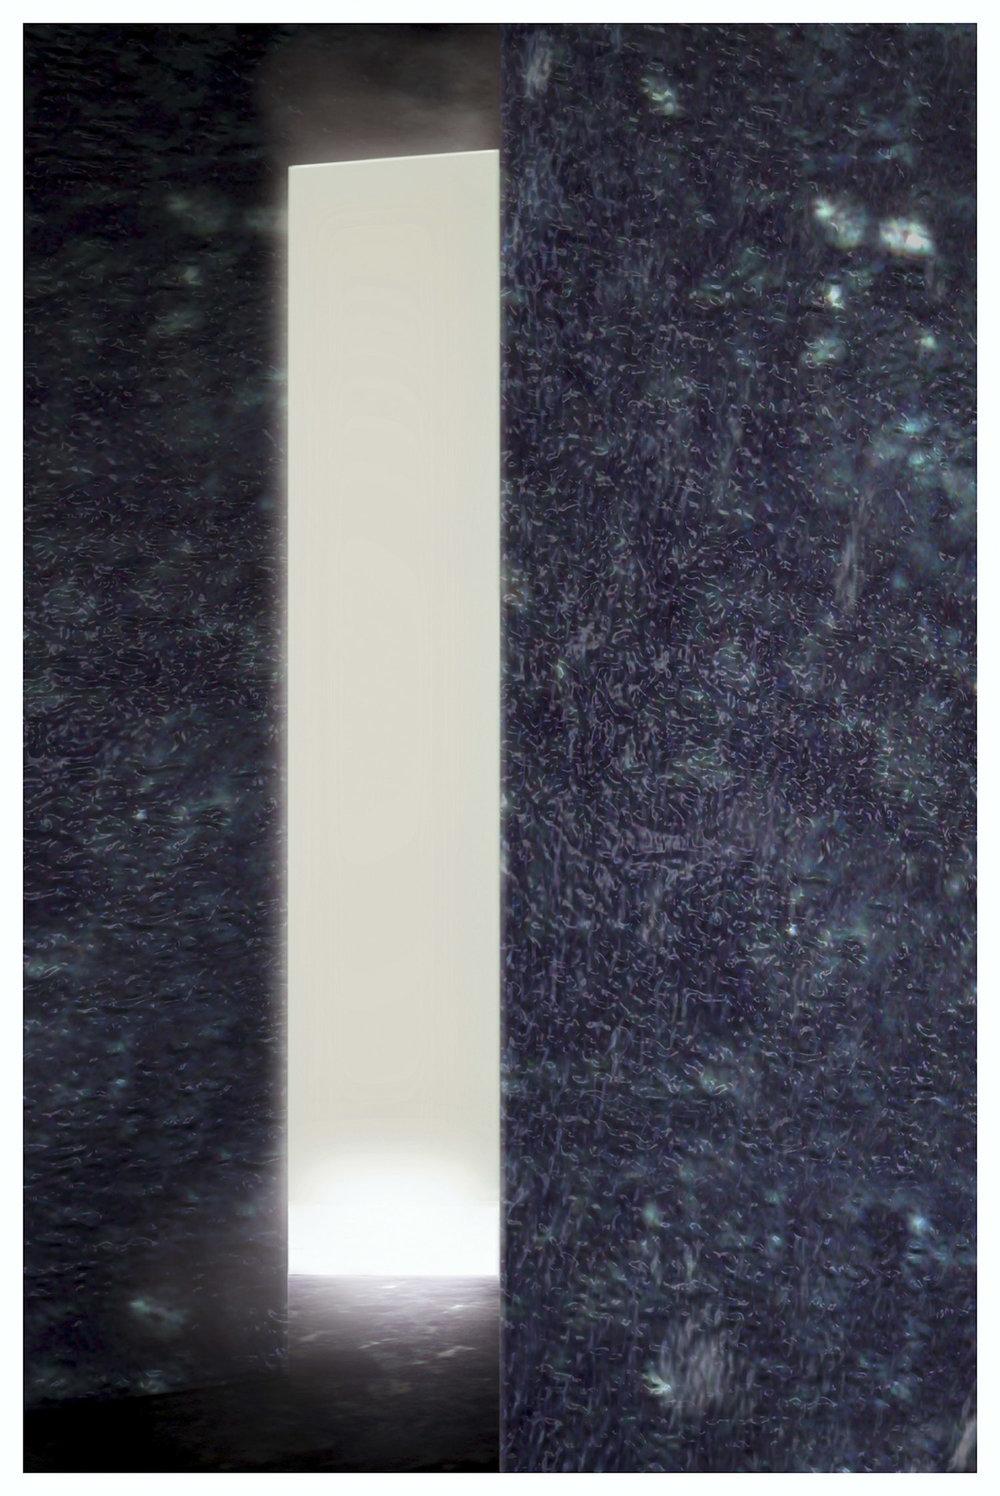 o.T. (CABIN IX) | 2009 | Fotografie, Aludibond und Plexiglas |196 x 126 cm